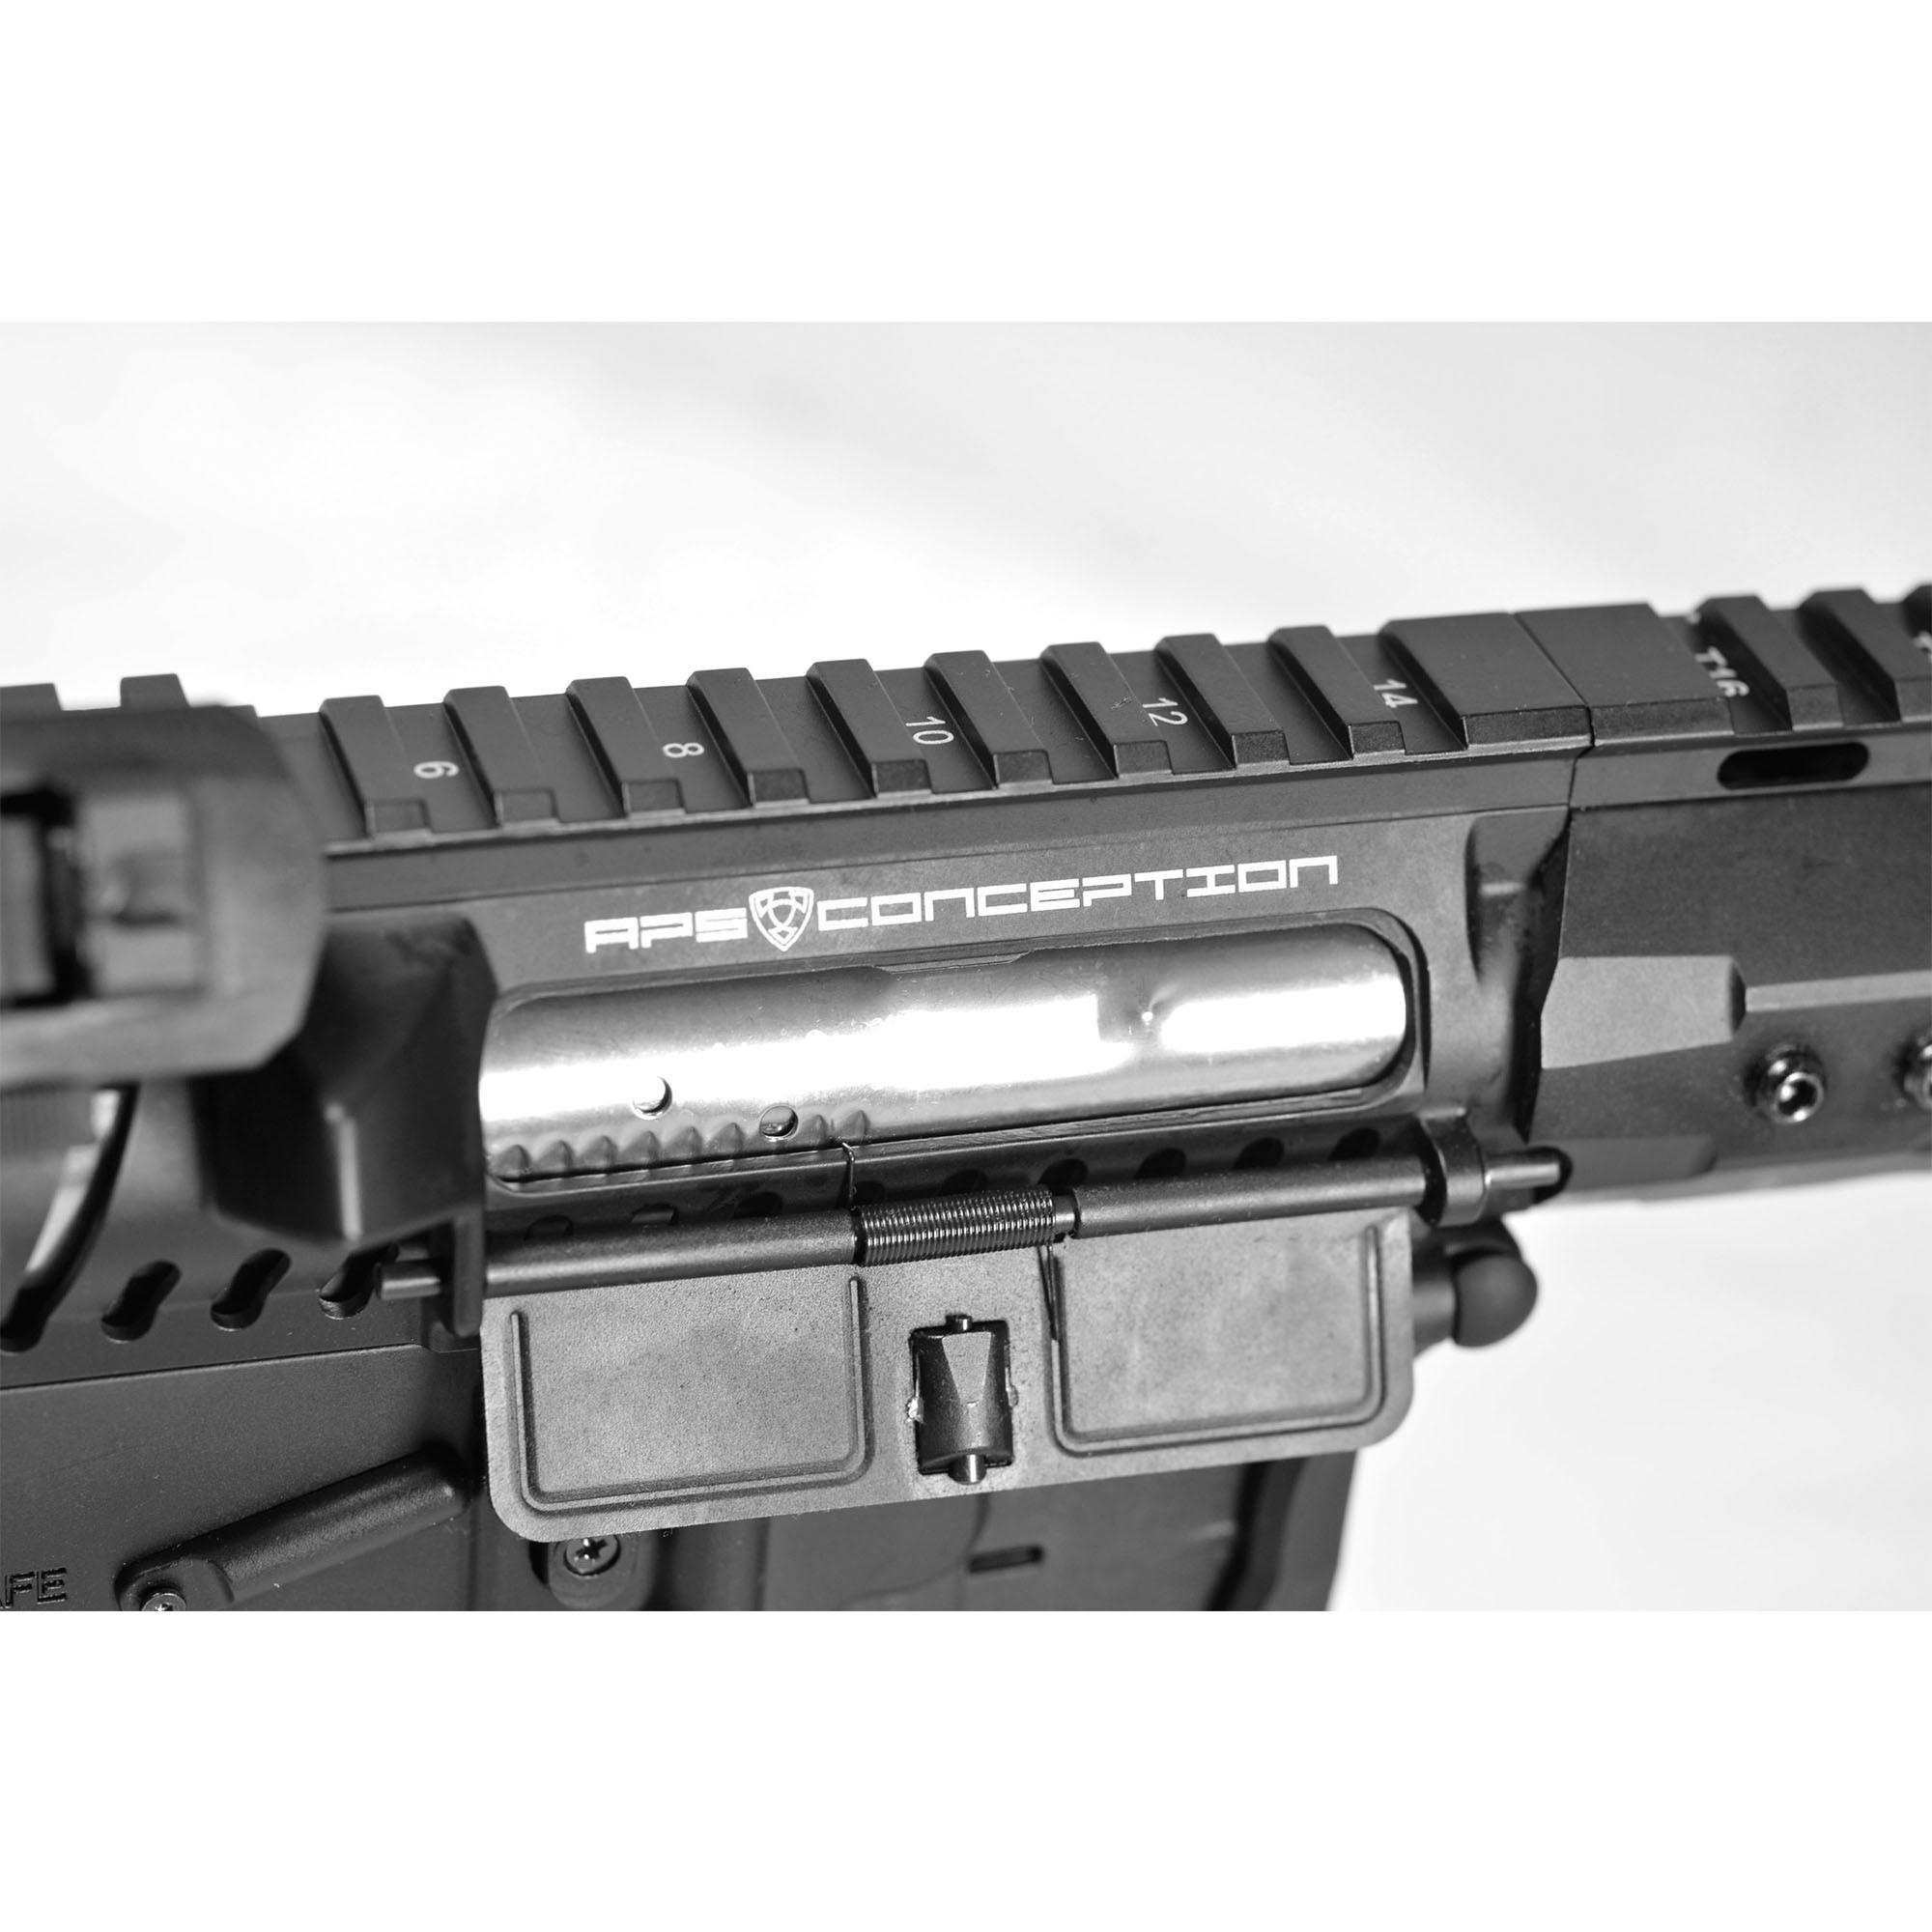 RIFLE DE AIRSOFT AEG M4 BLACK DRAGON FMR MOD1 RB FULL METAL BLOWBACK ASR120B - APS